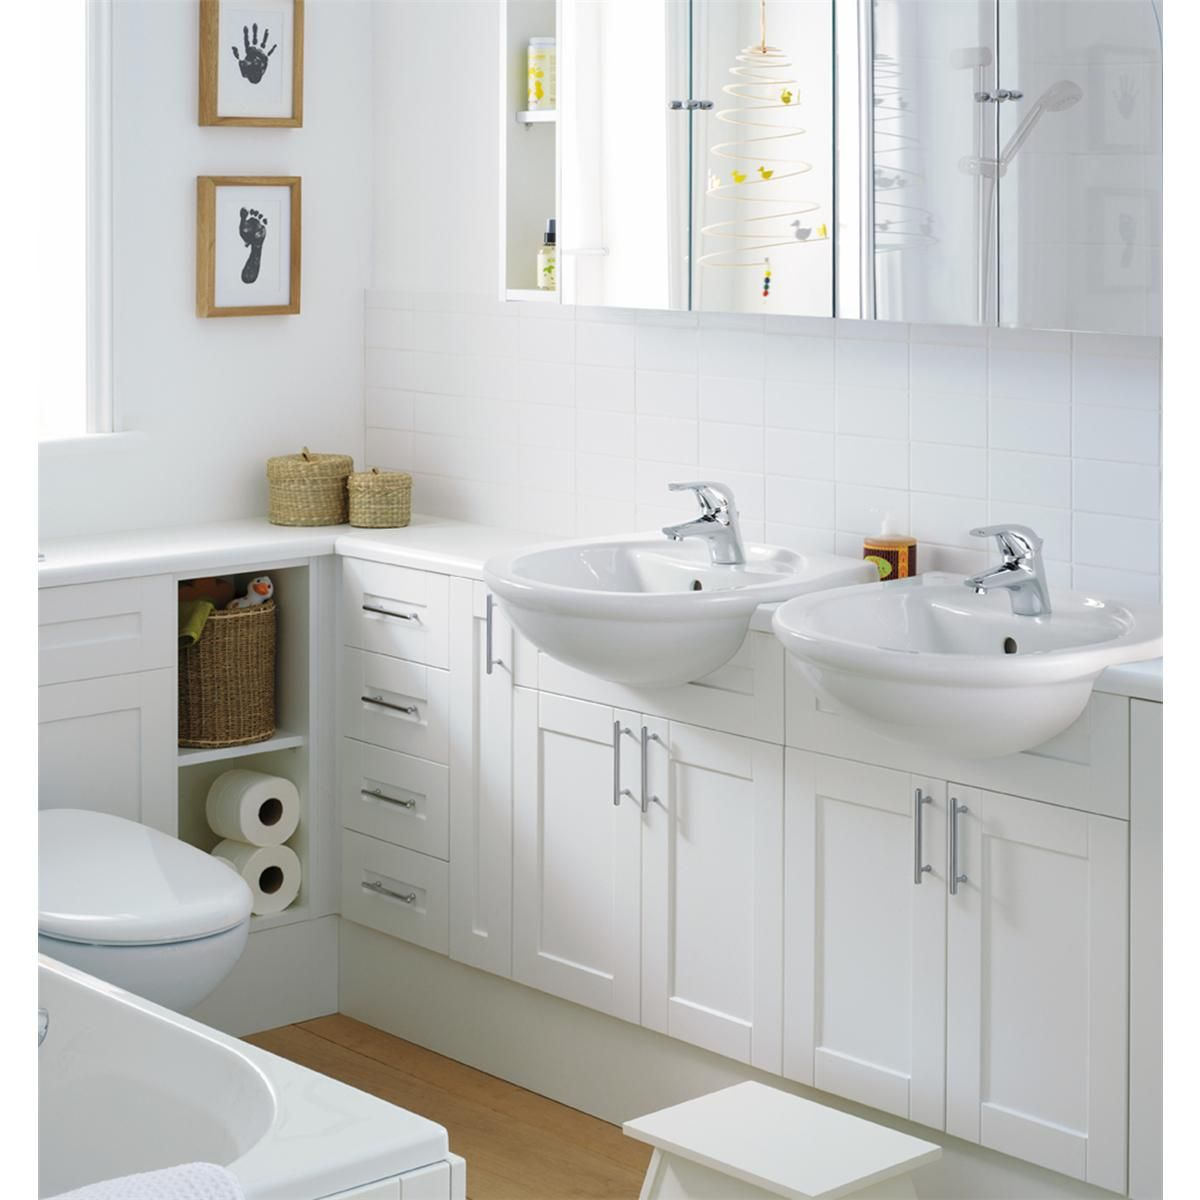 Small White Ikea Bathroom Vanity Units Bathroom Storage Ideas